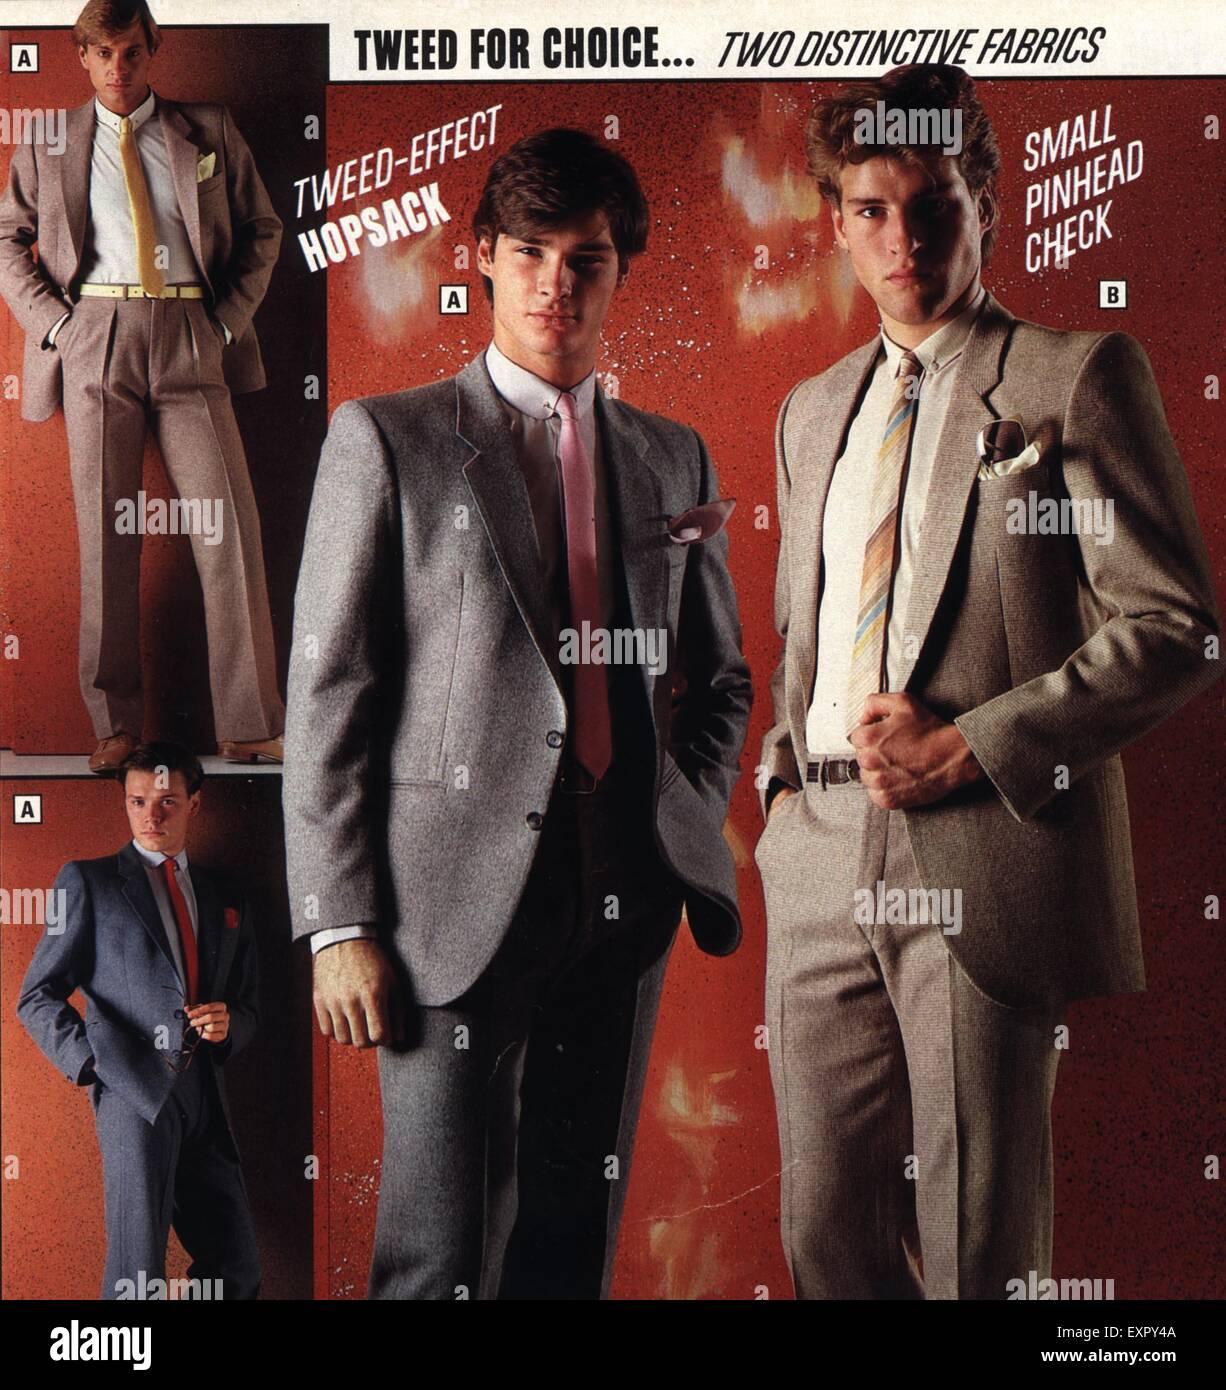 1980s UK Mens Fashion Catalogue Brochure Plate